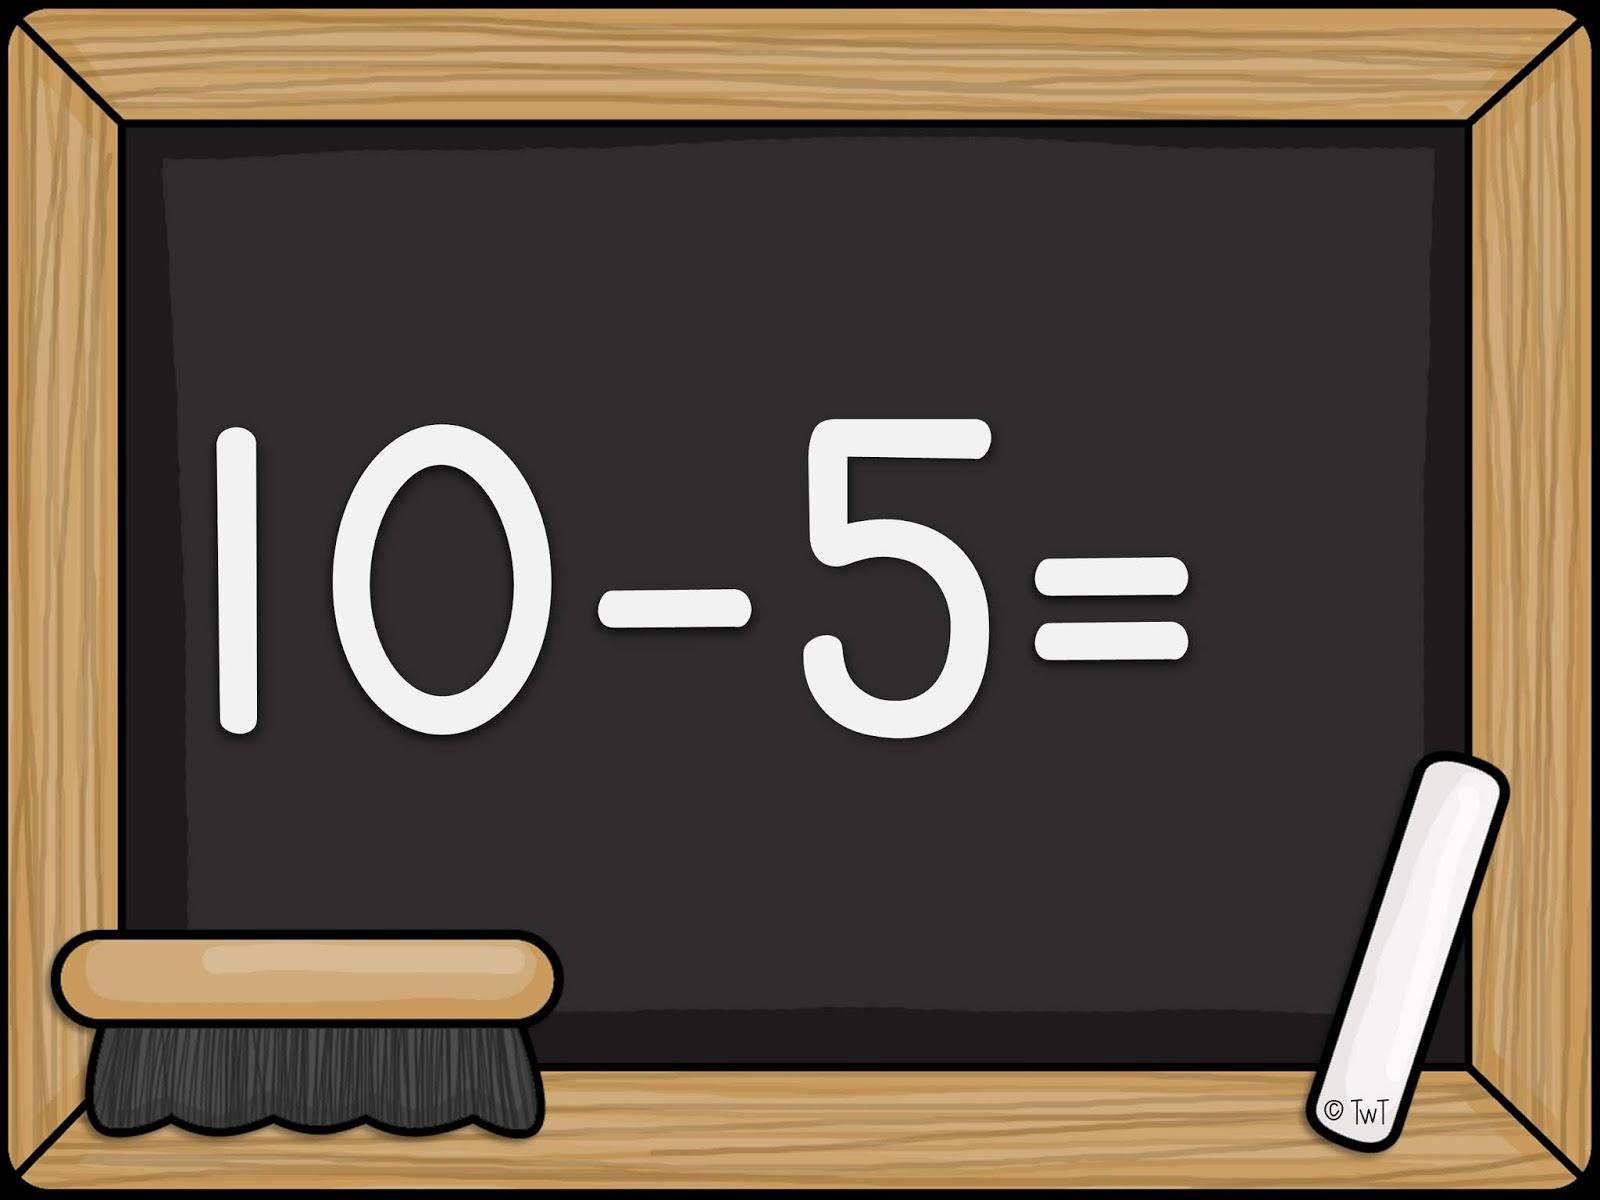 Teaching With Terhune: Digital Flash Cards To Practice Math